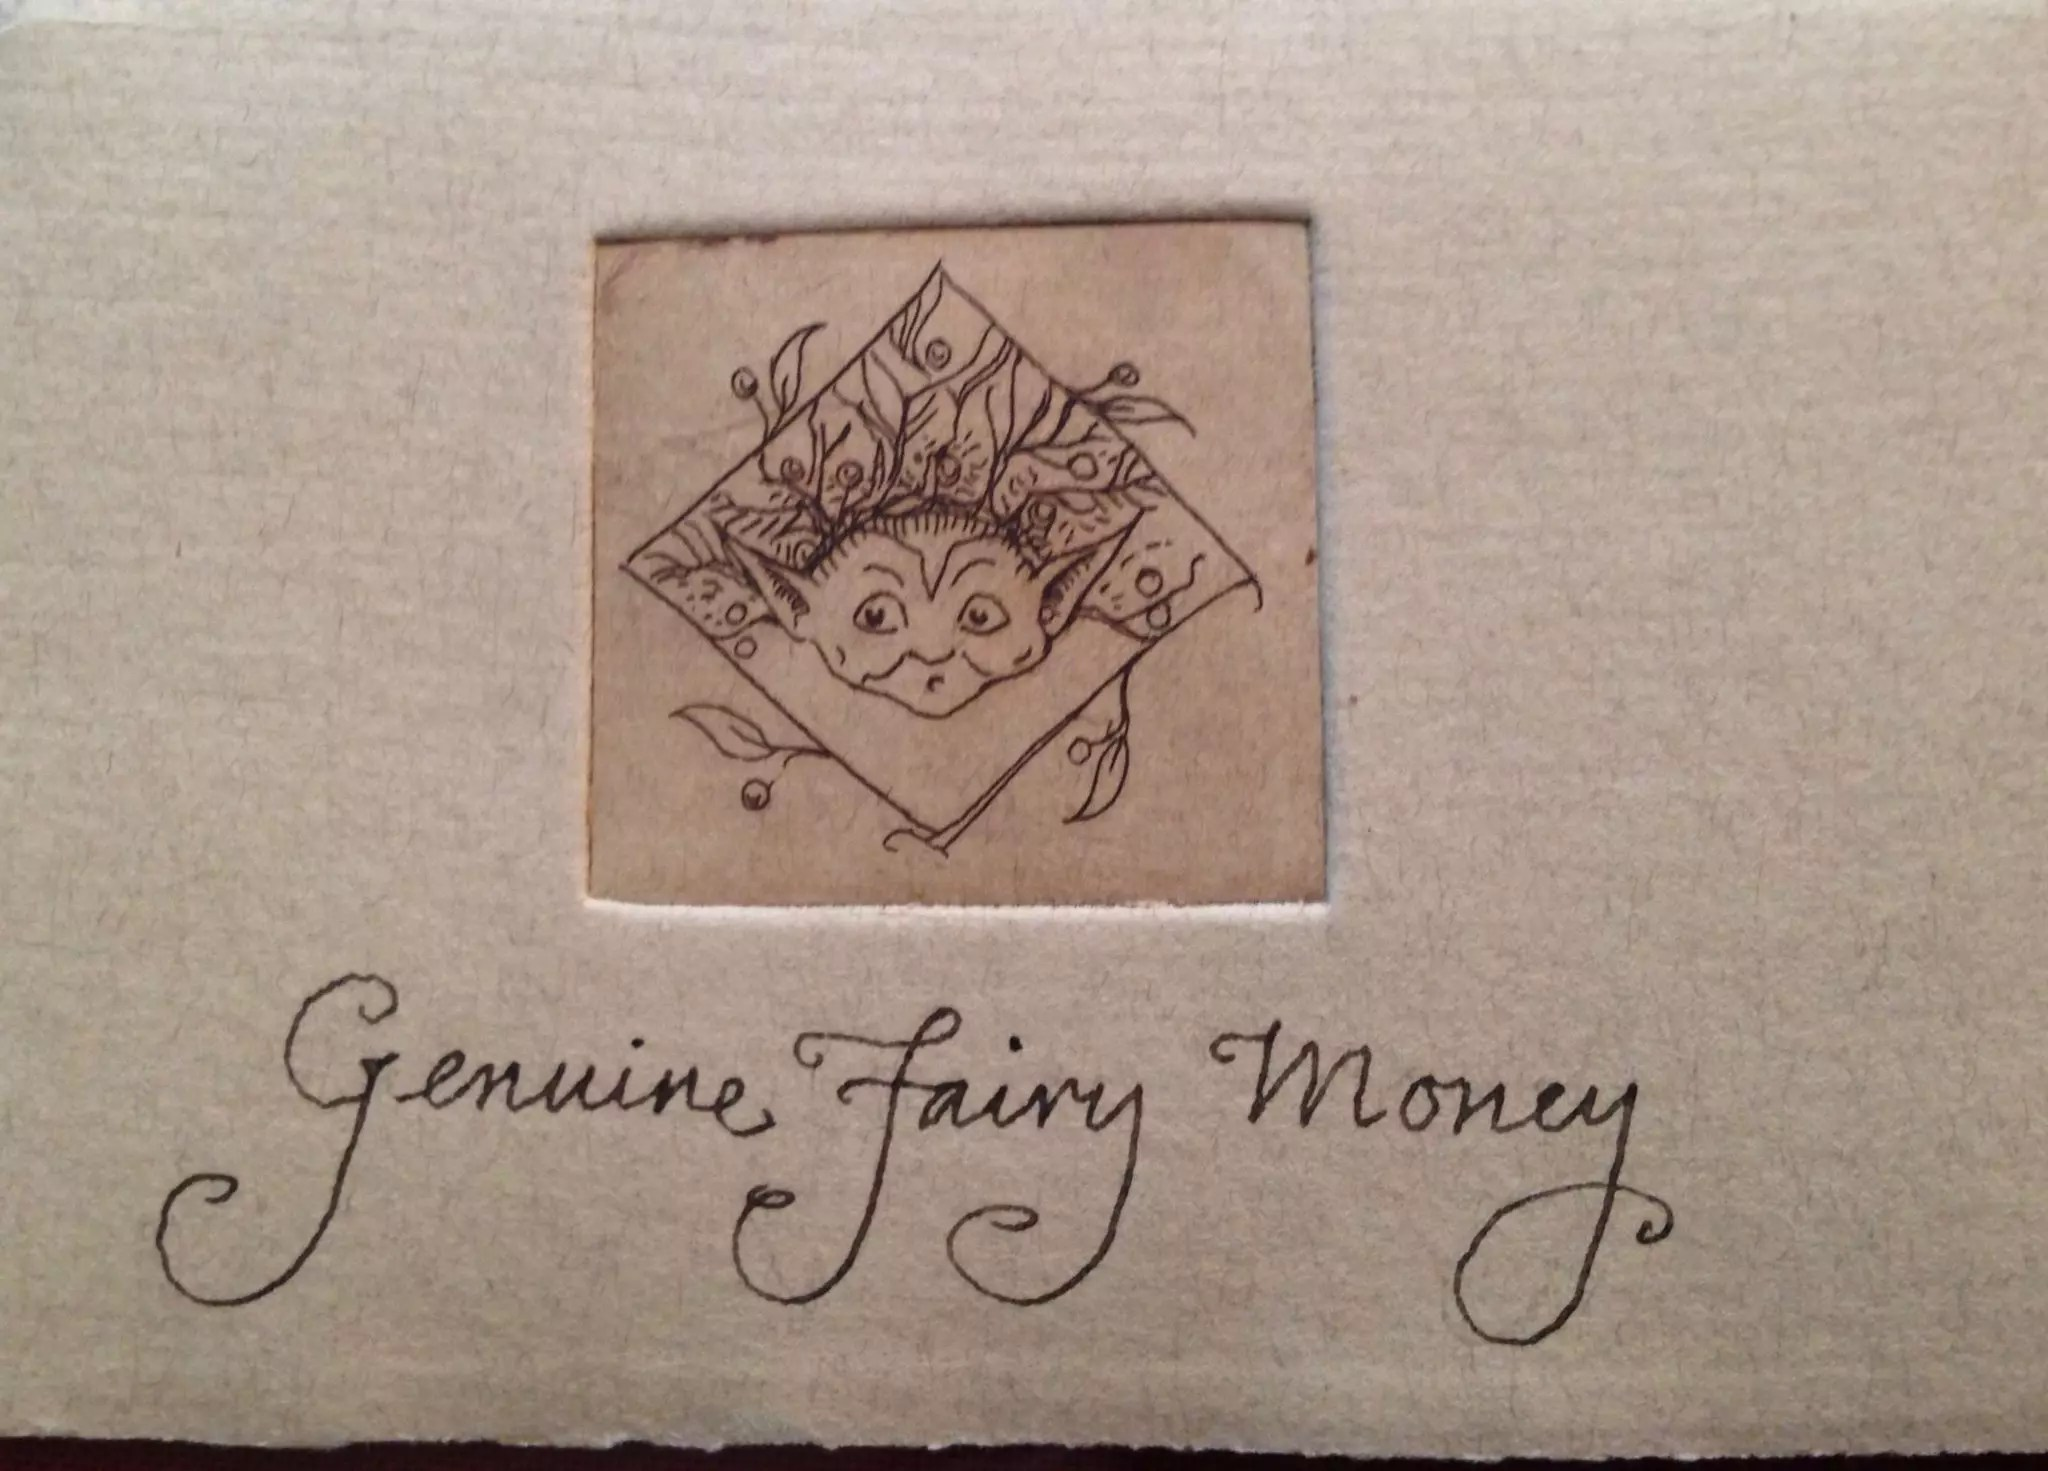 CVS Ephemera fairy money